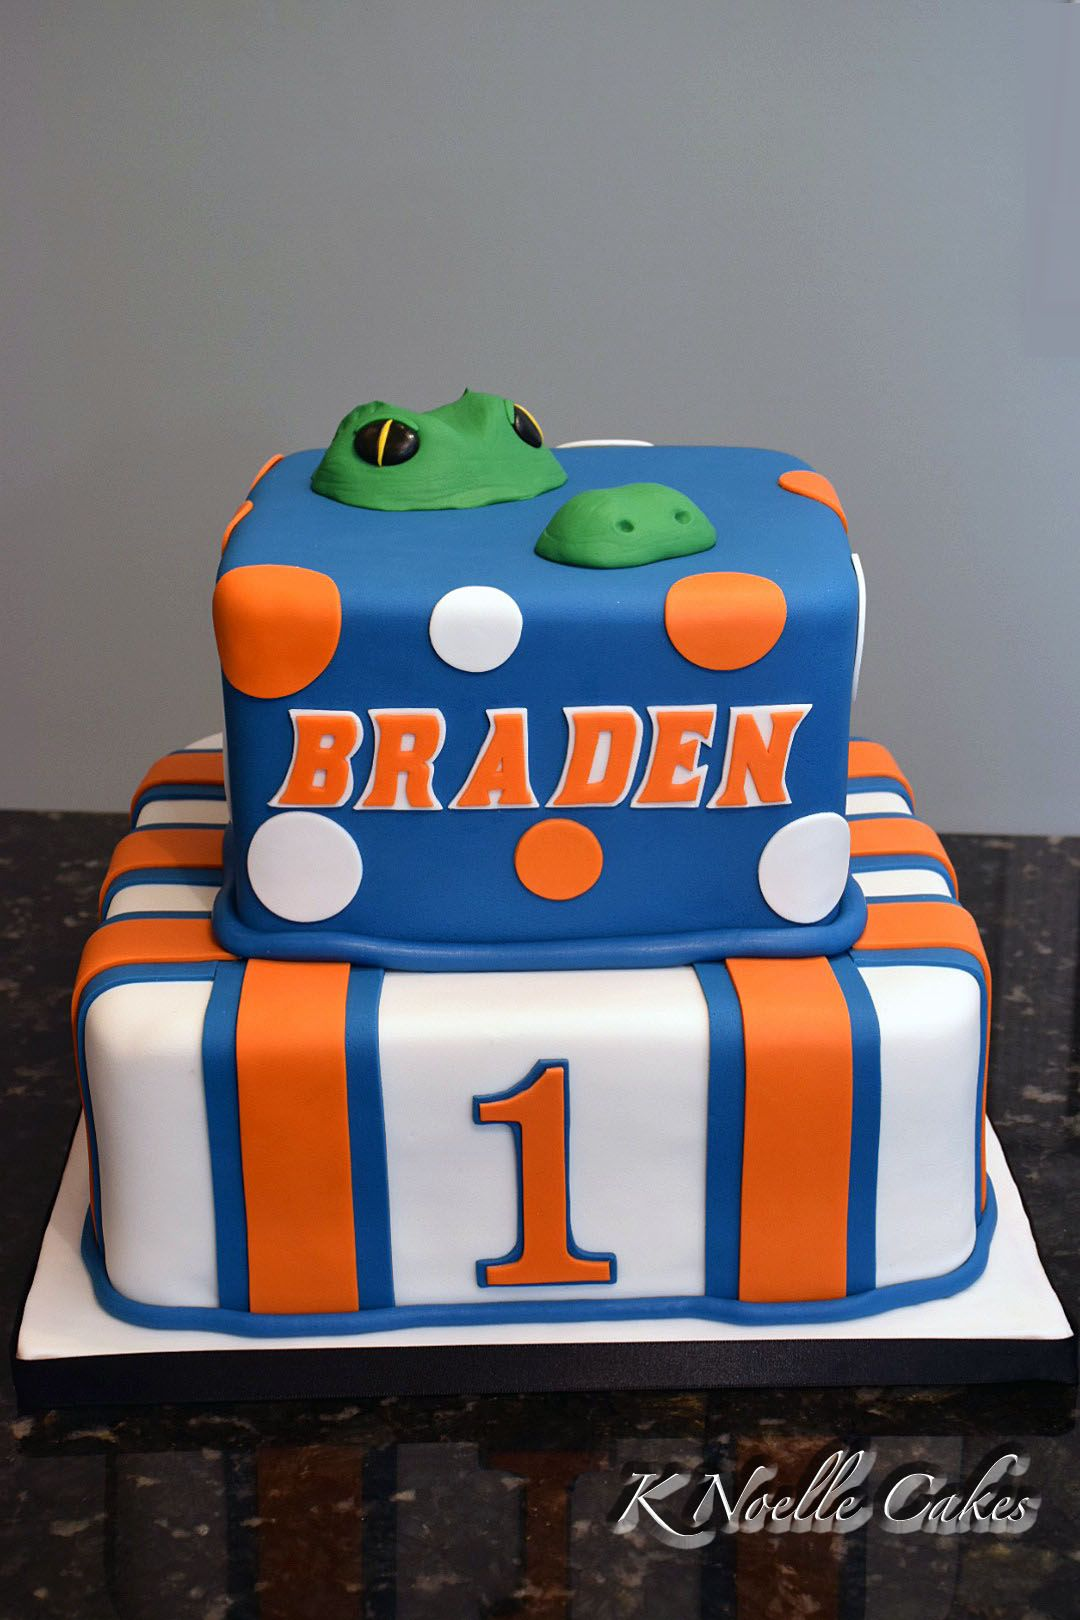 Gator Theme 1st Birthday Cake By K Noelle Cakes Cakes By K Noelle